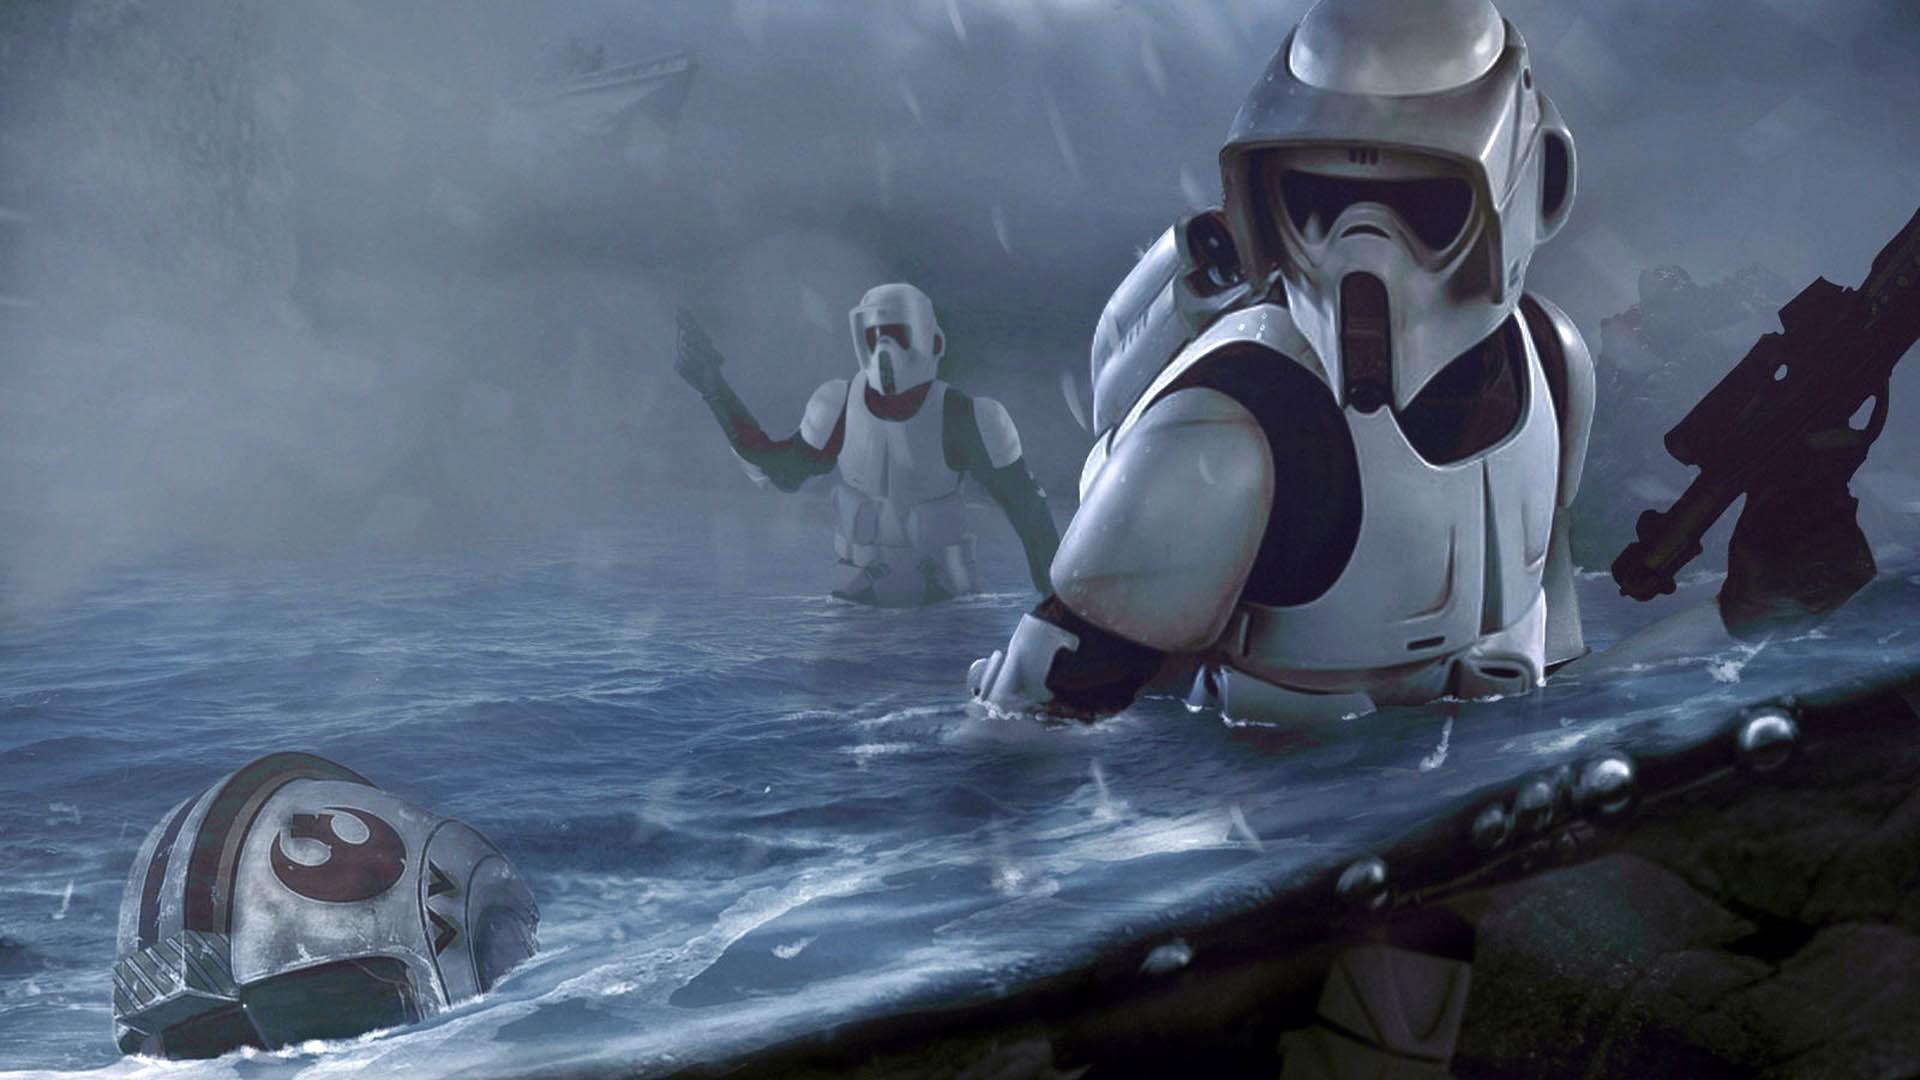 Star Wars Scout Trooper Wallpaper 64 Images